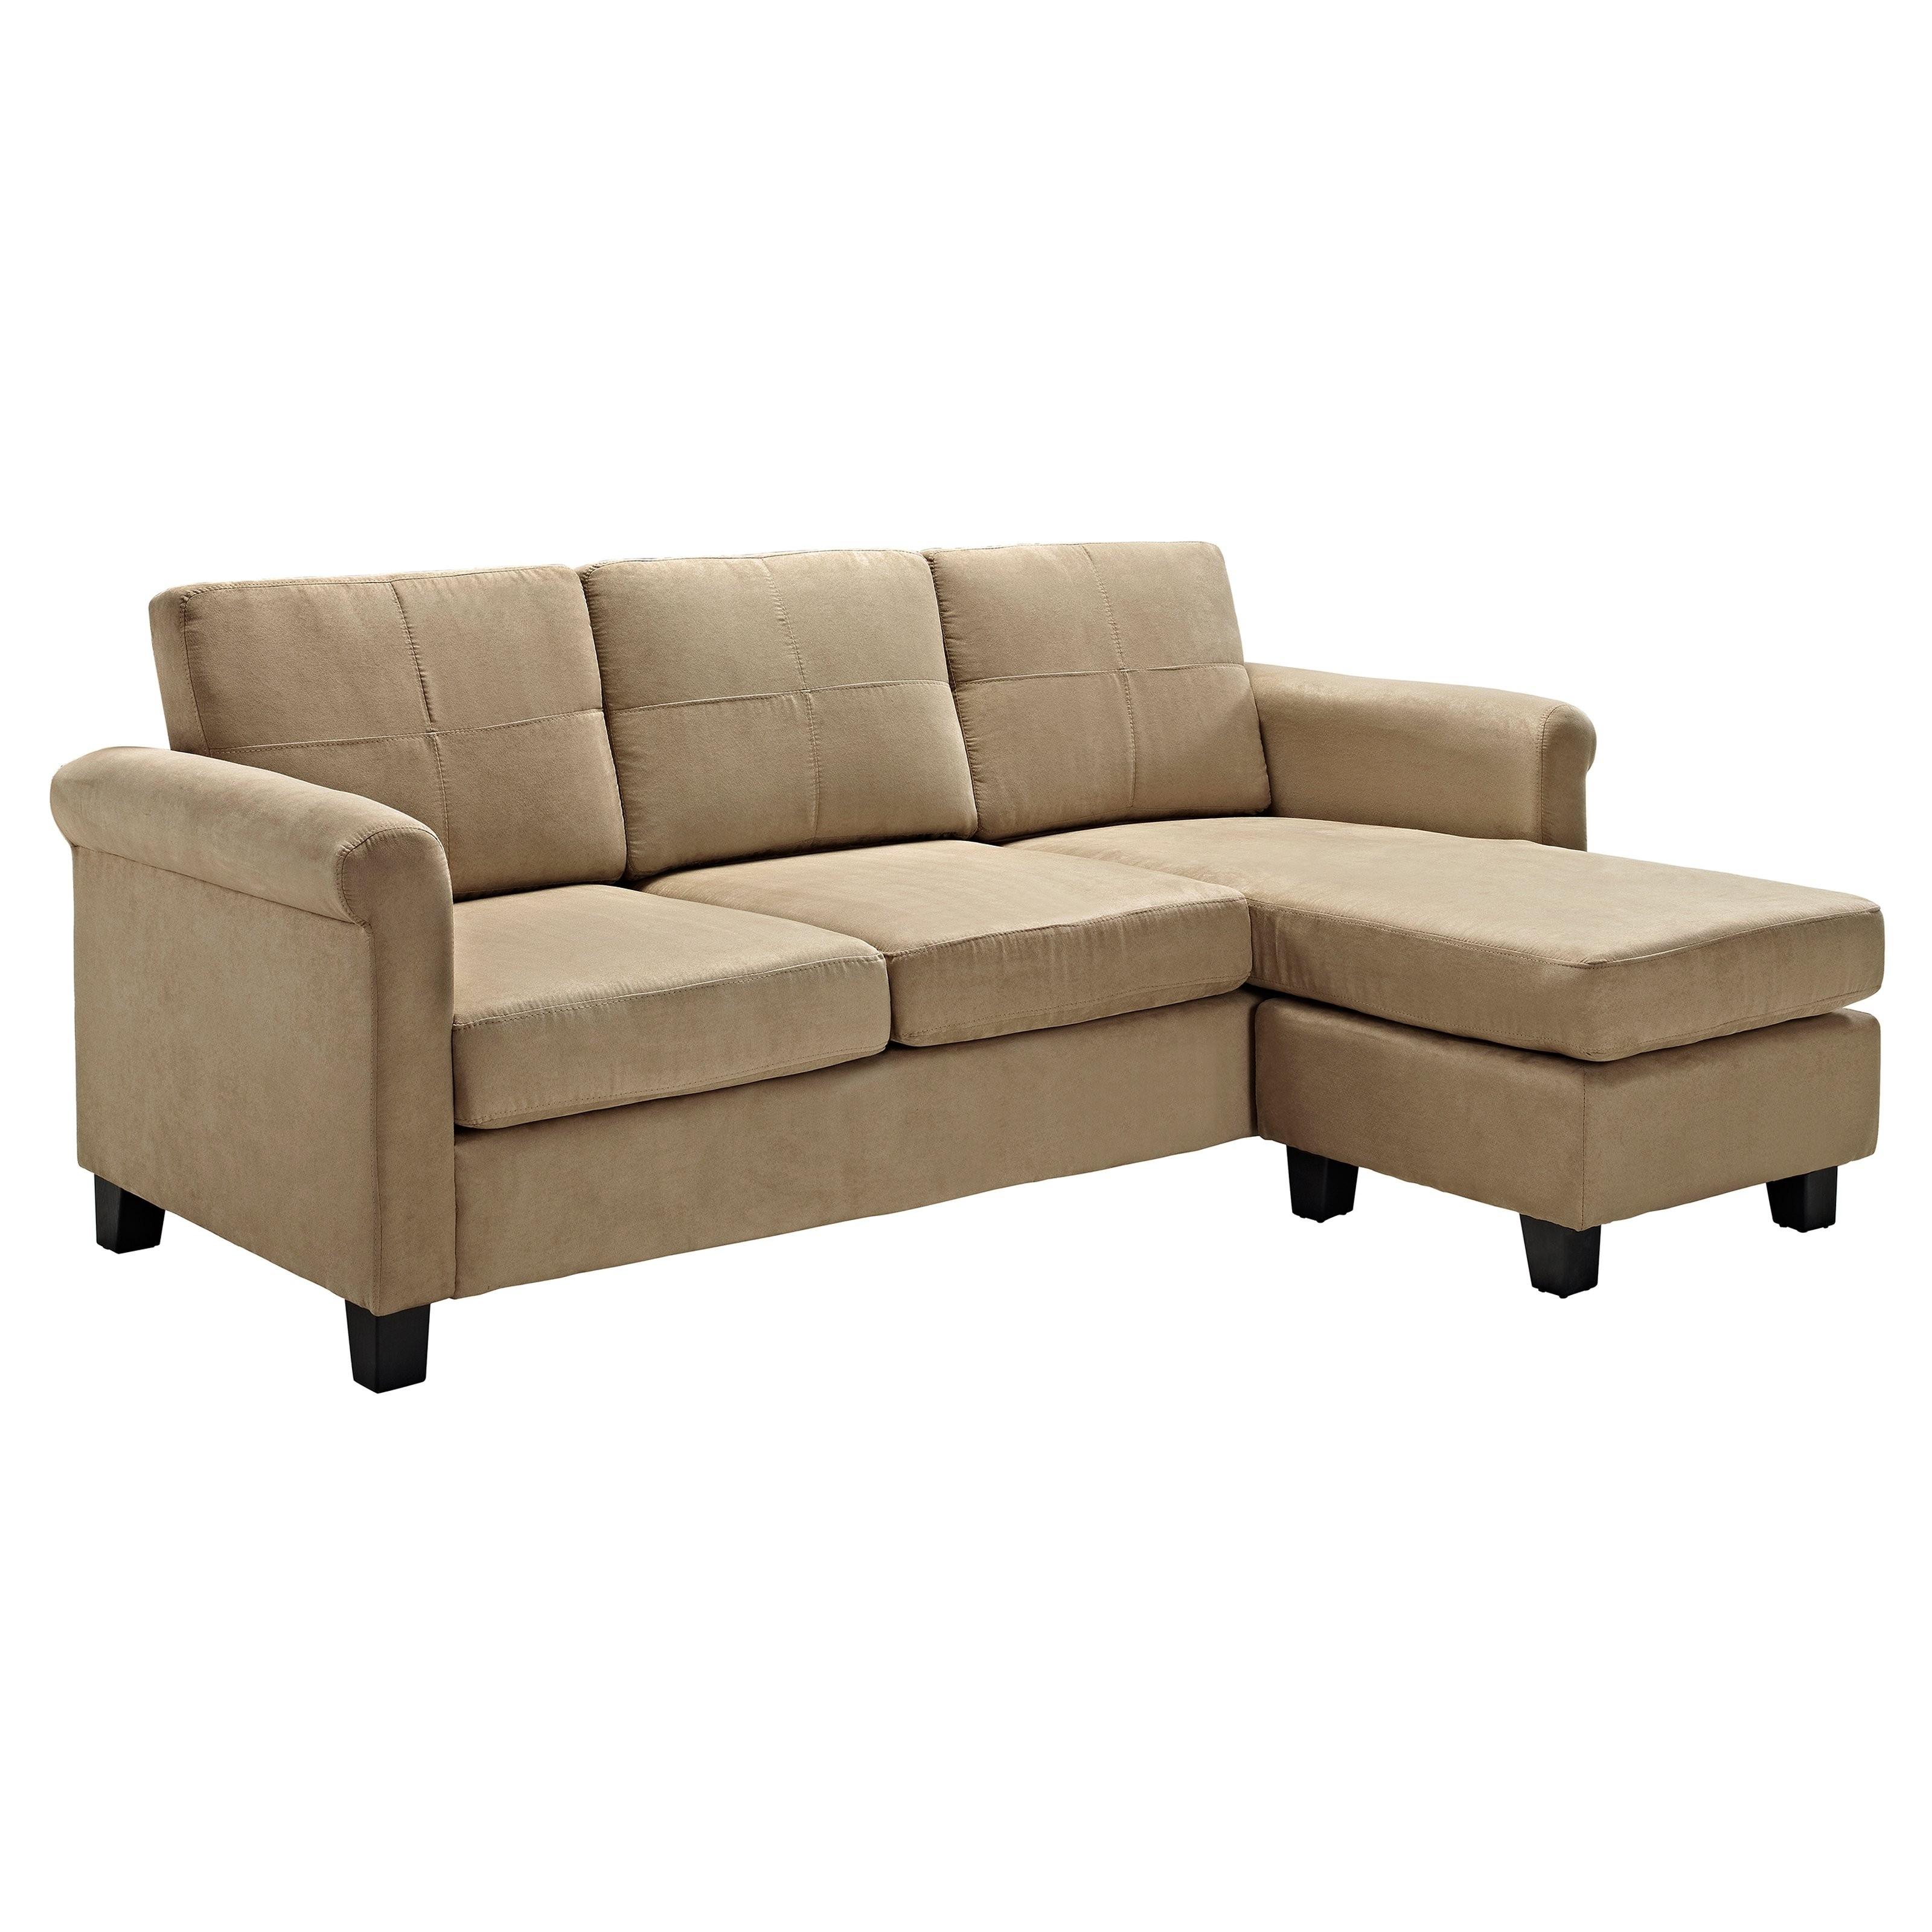 Recent Beautiful Target Sectional Sofa – Buildsimplehome Regarding Target Sectional Sofas (View 9 of 20)